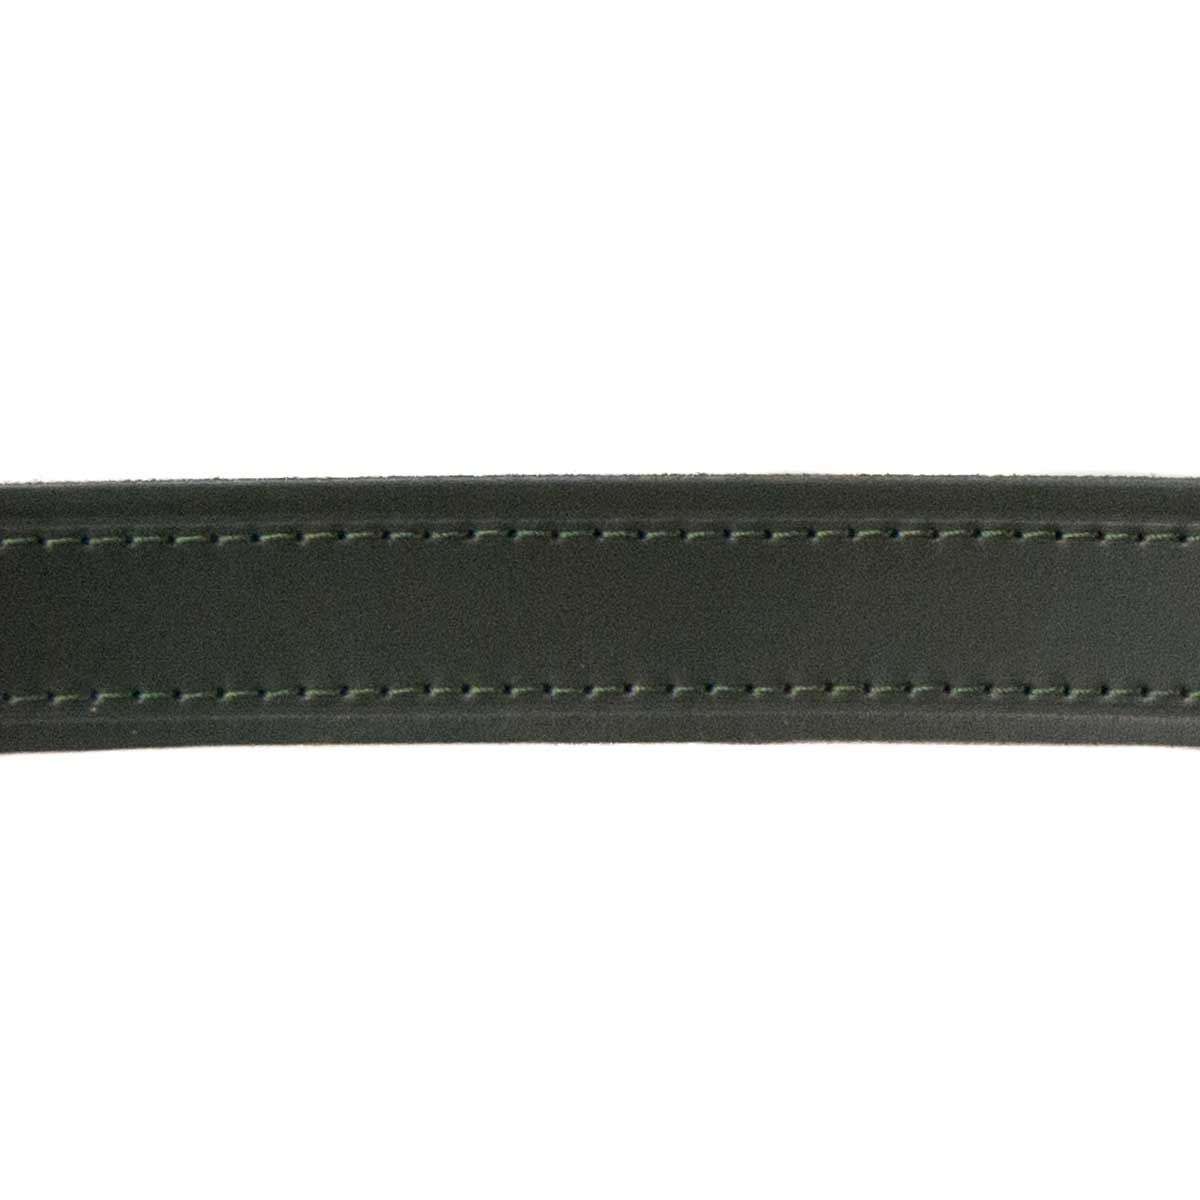 Montevita Casual Quality Belt in Green